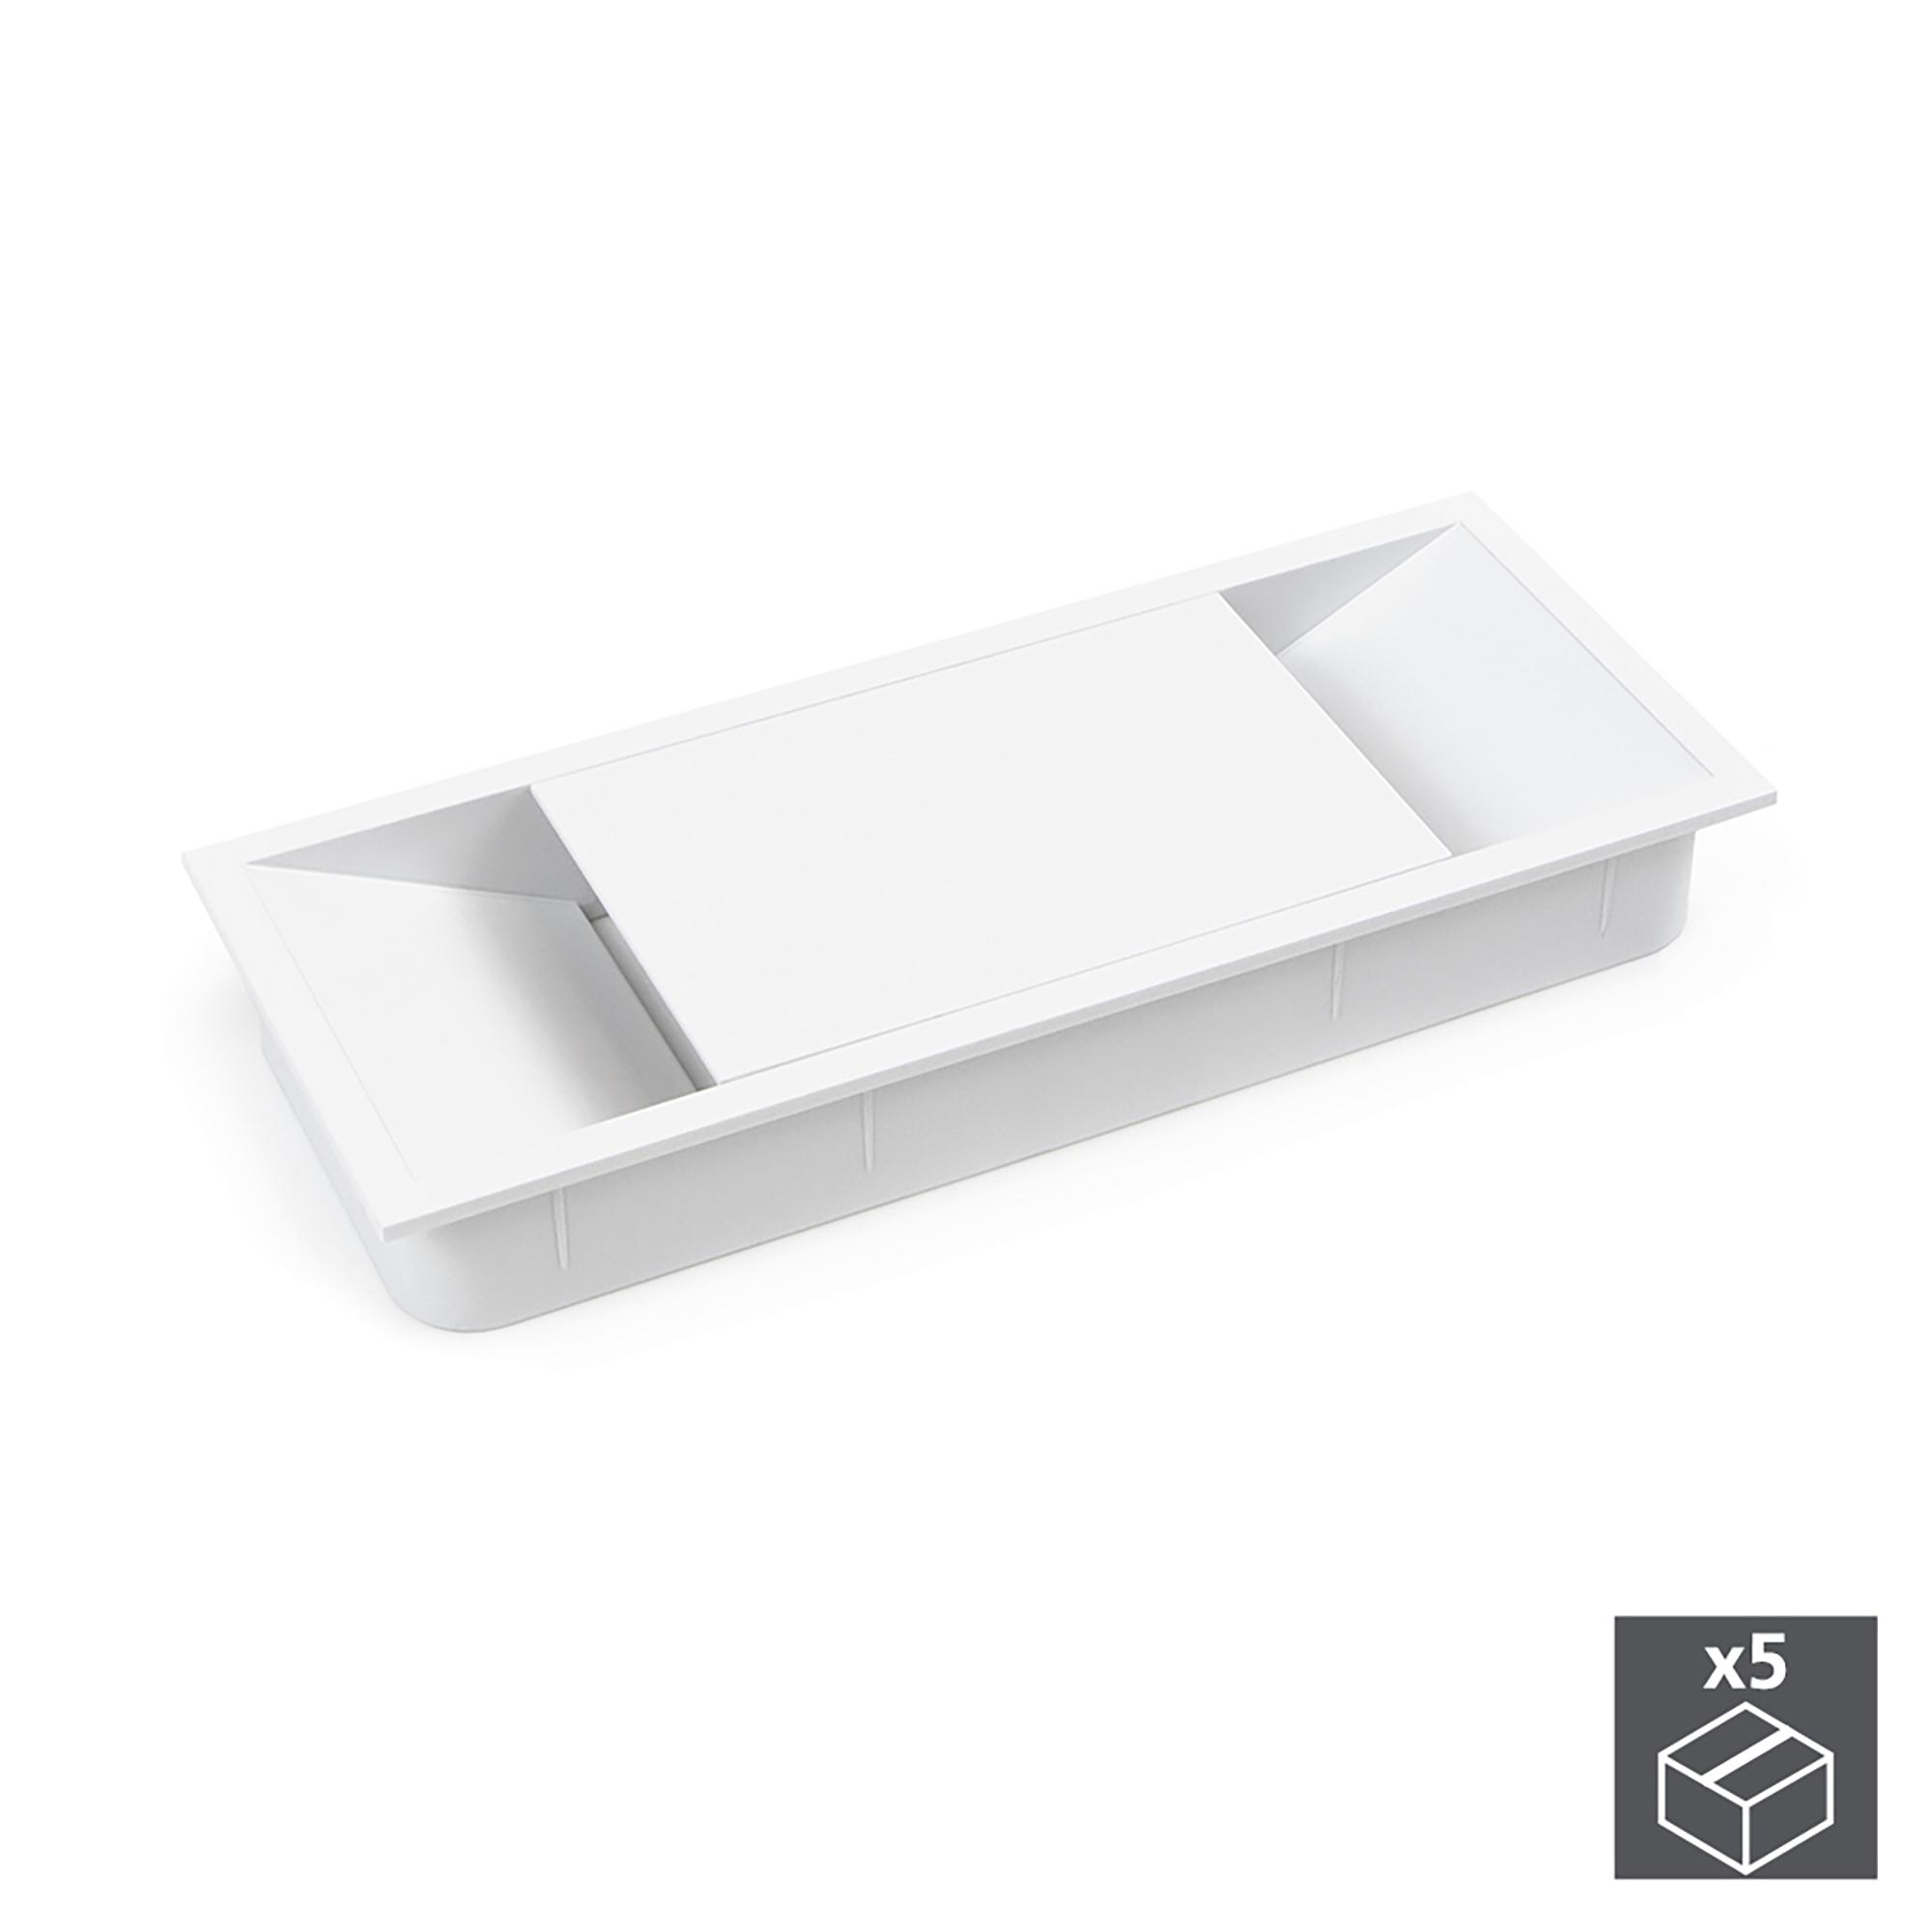 Emuca Passacavi da tavolo, rettangolare, 152 x 61 mm, da incasso, Plastica, Bianco, 5 u.